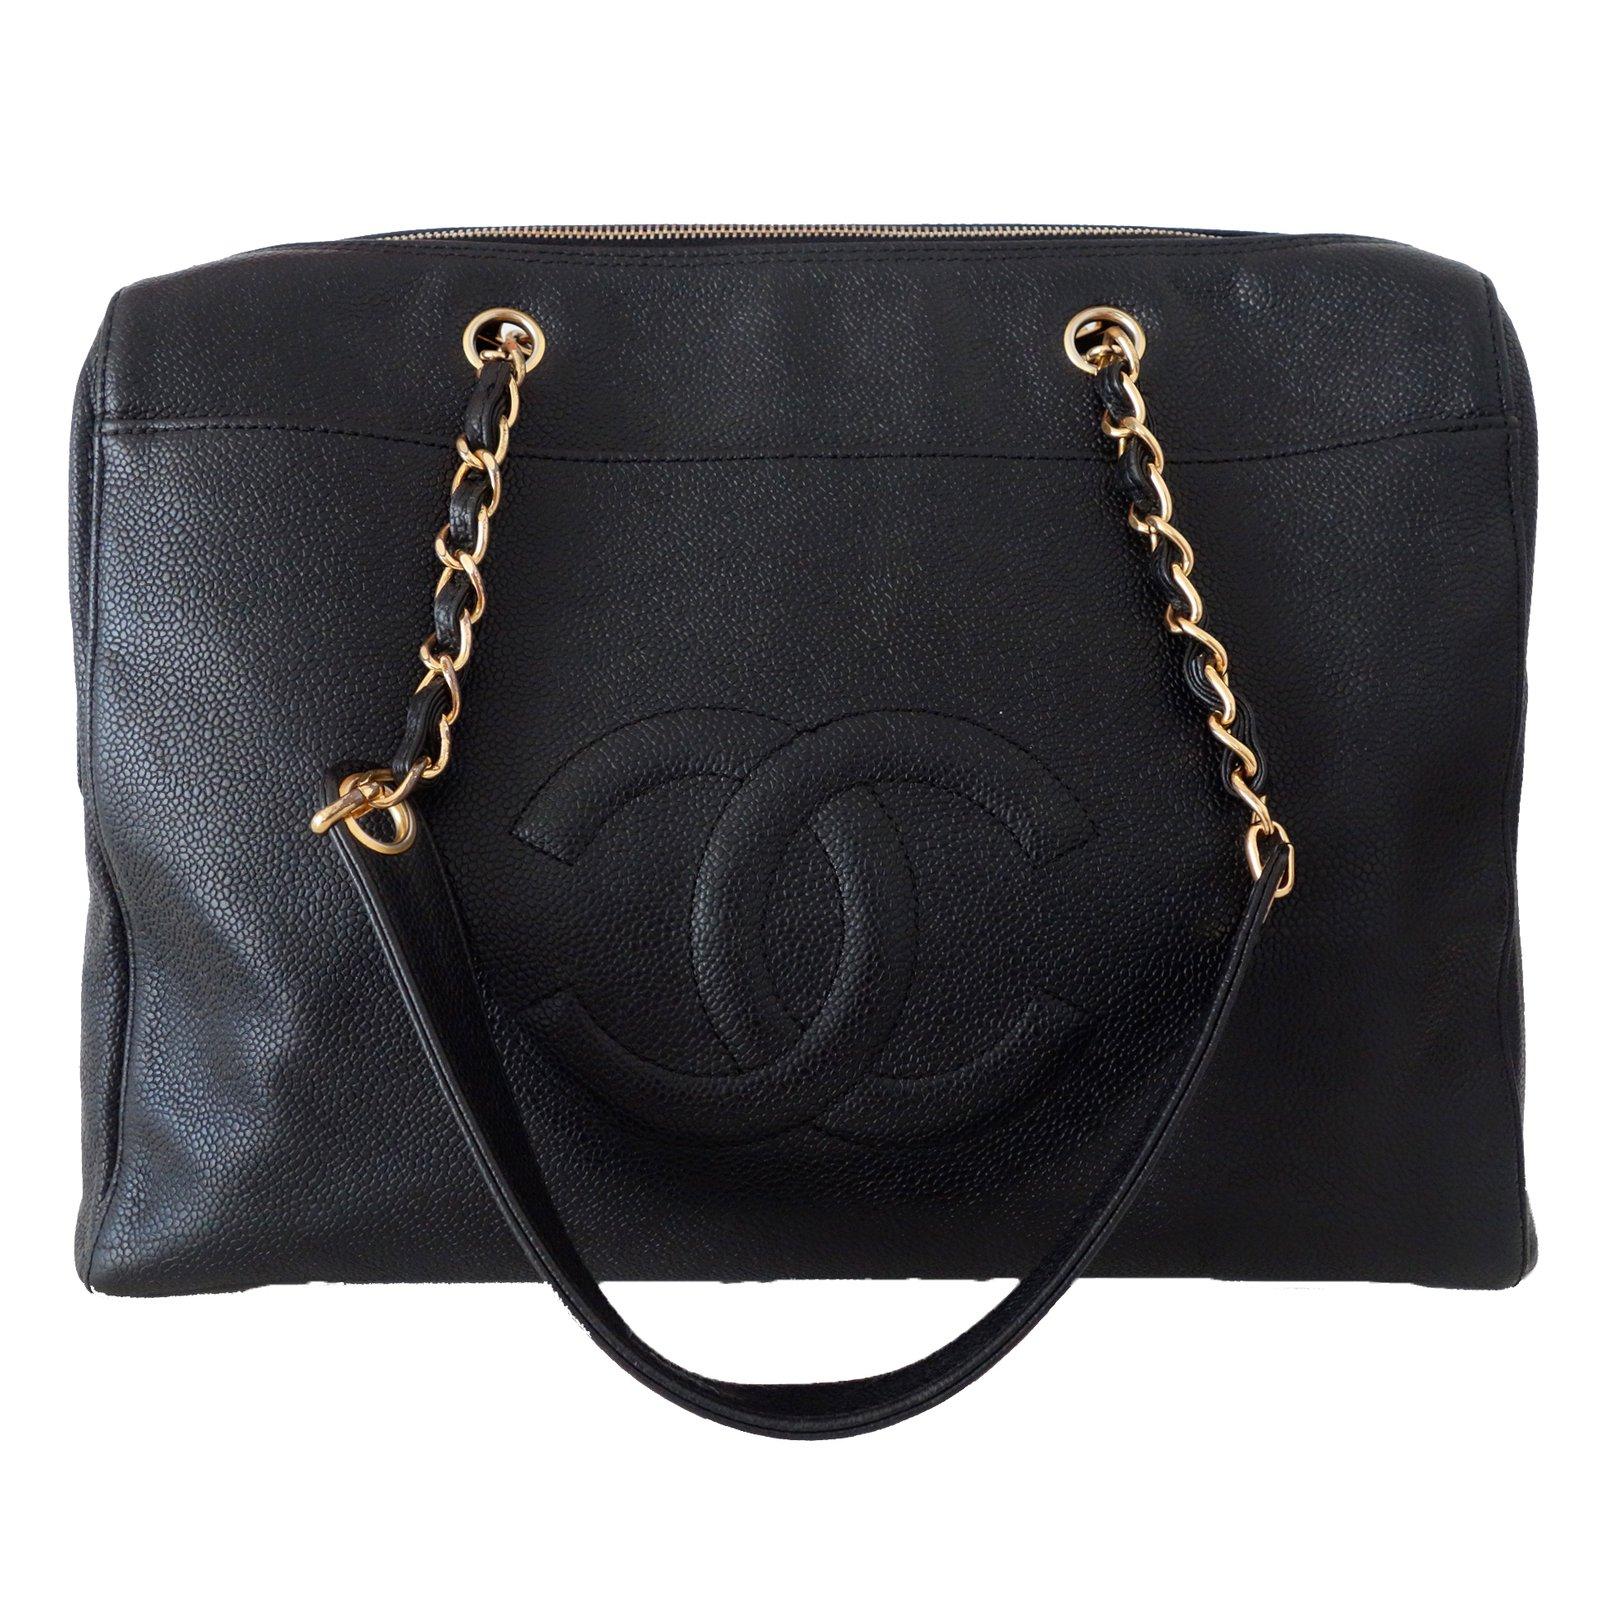 sacs main chanel sacs main cuir noir joli. Black Bedroom Furniture Sets. Home Design Ideas